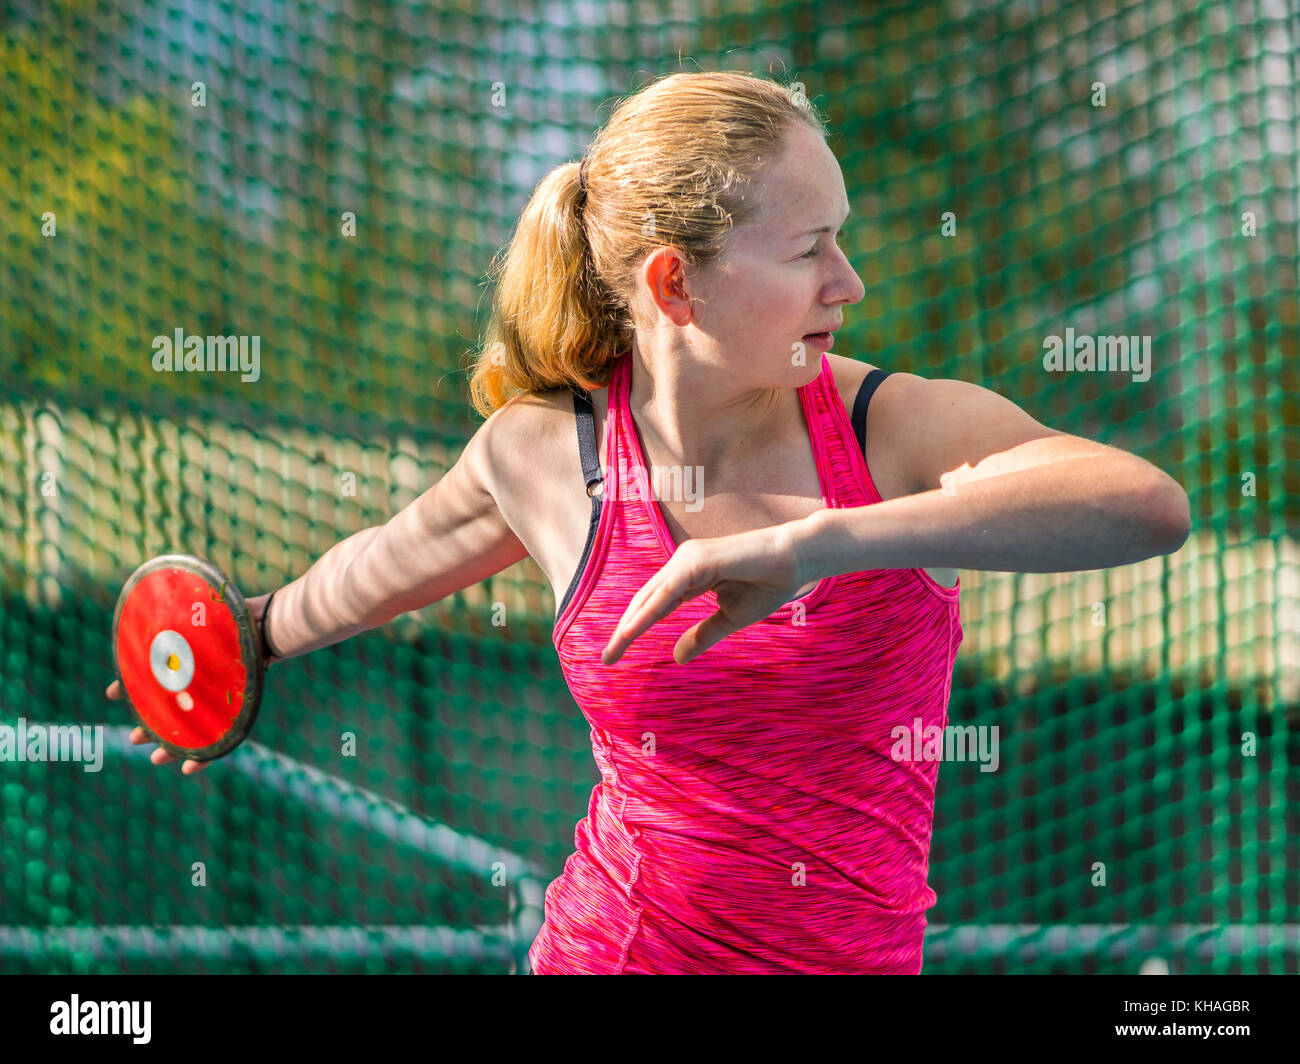 Woman, athletics, discus throwing - Stock Image